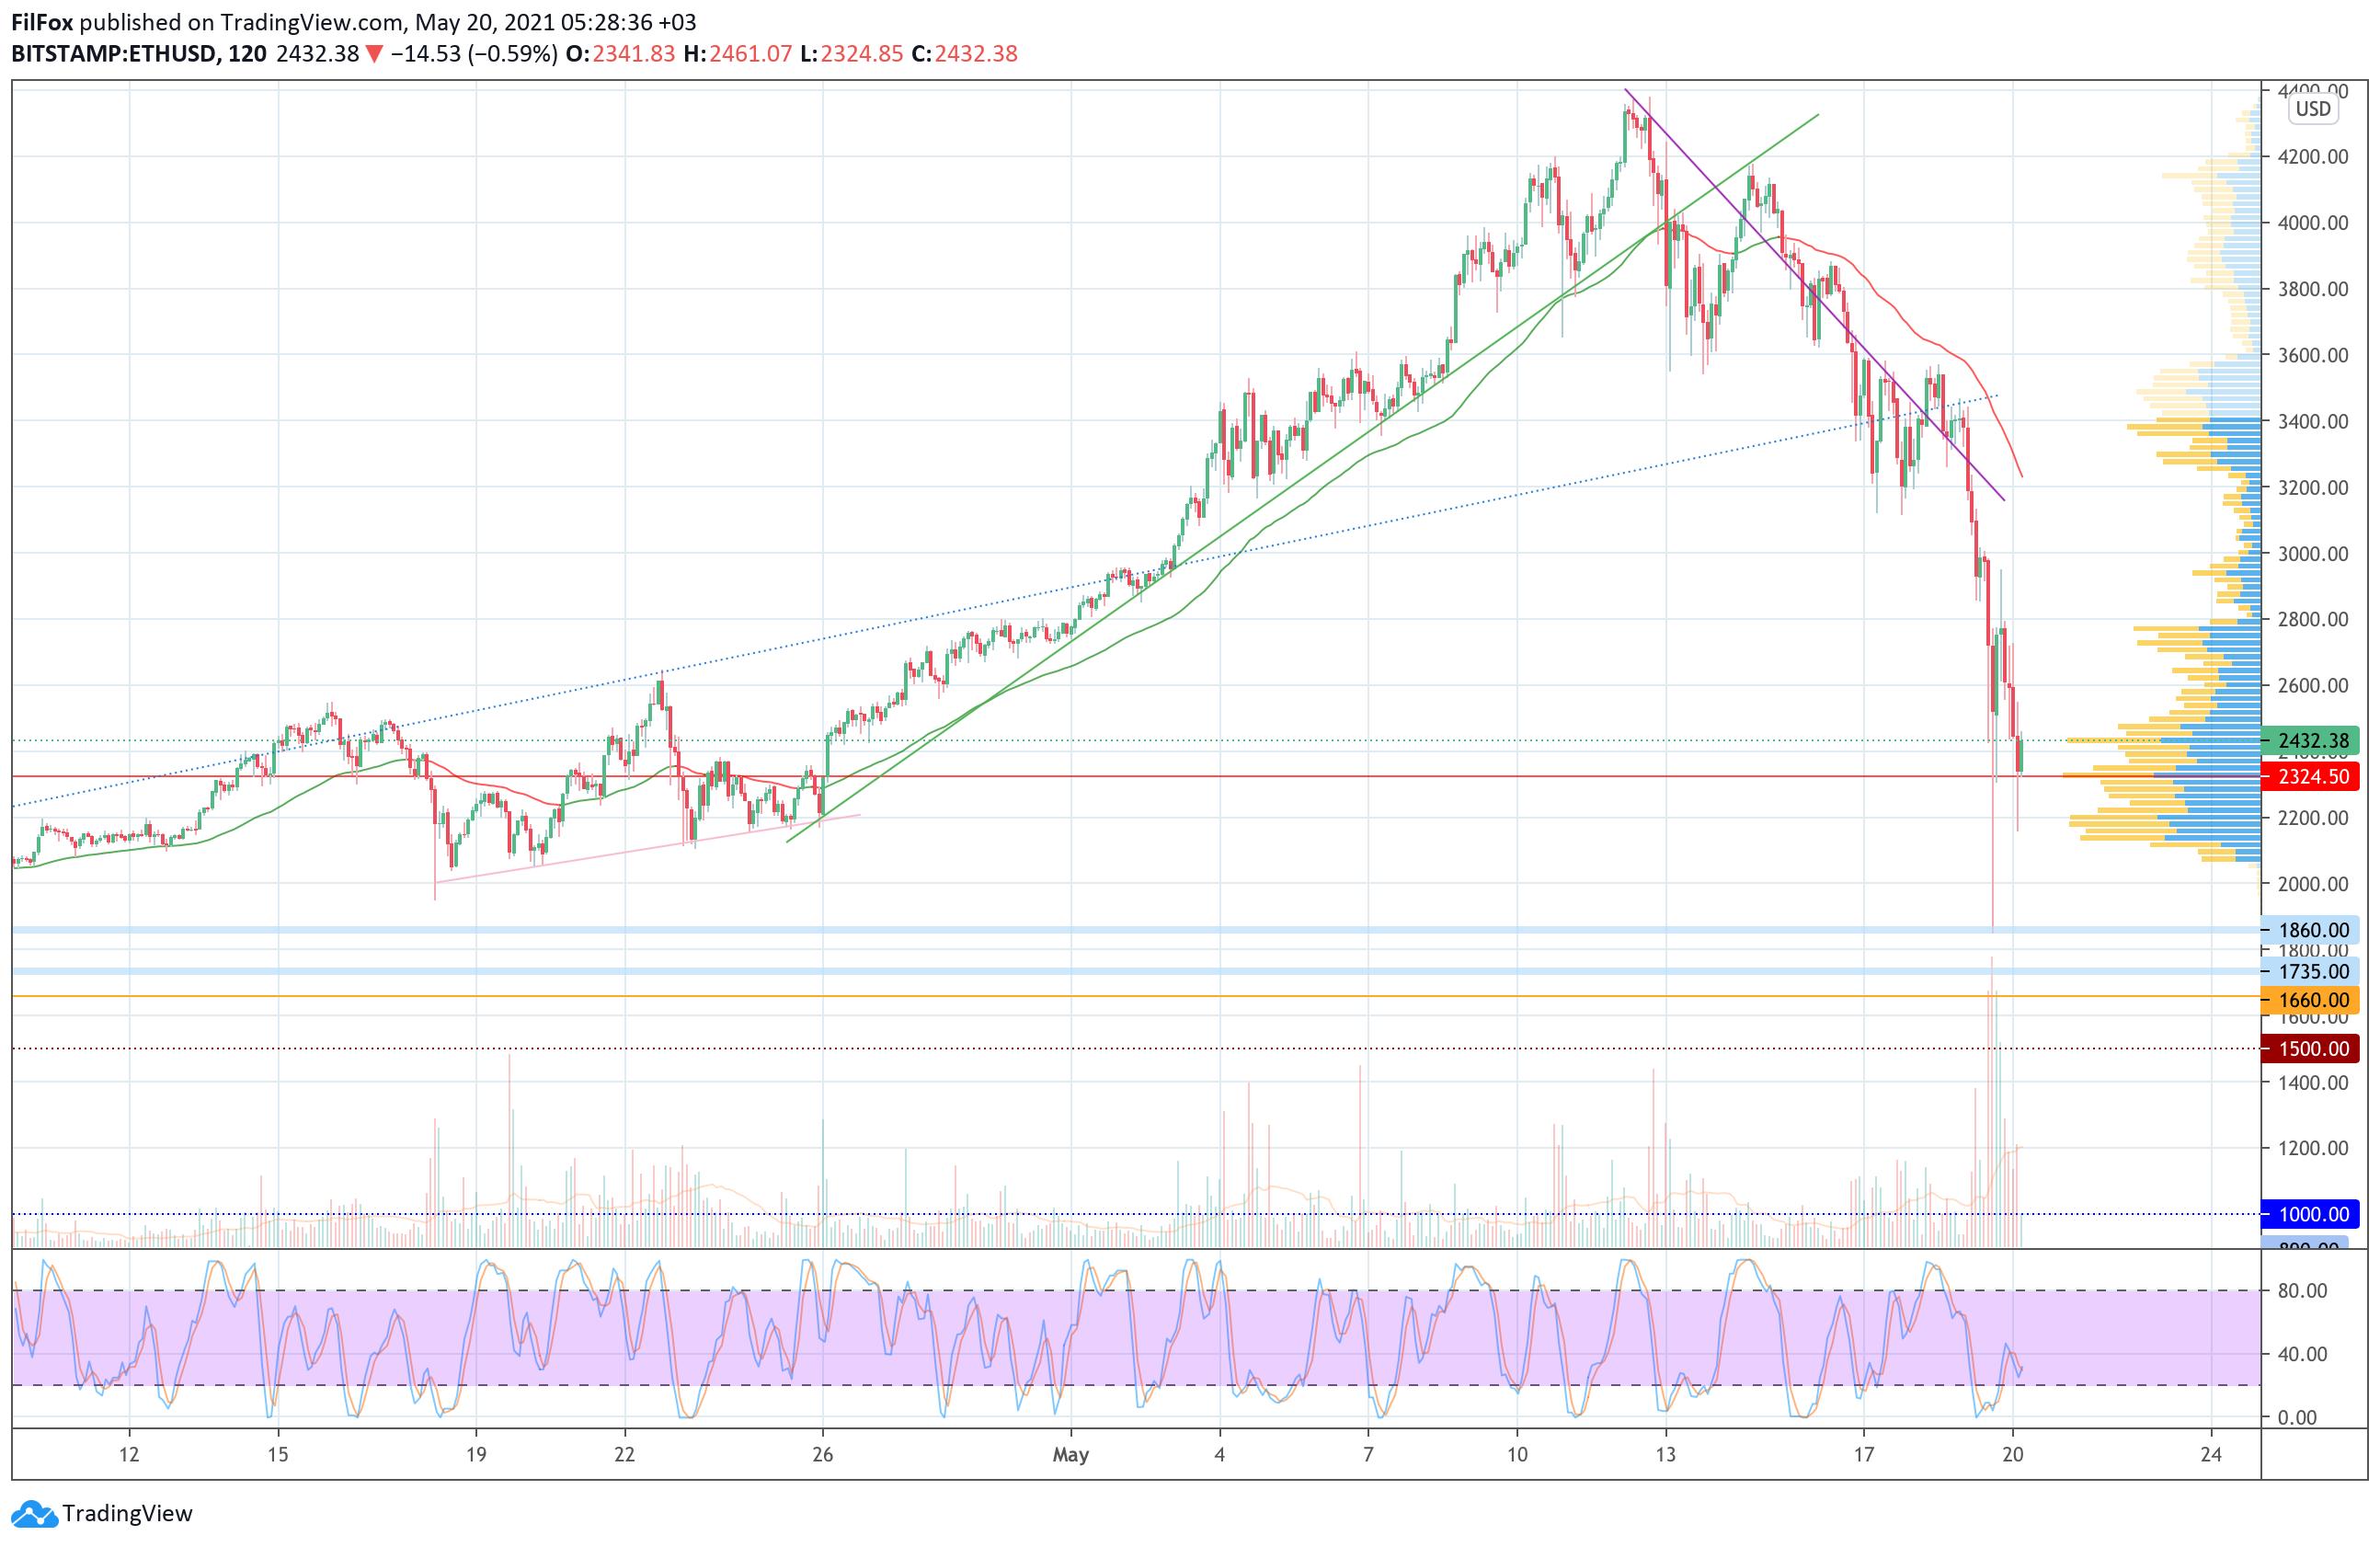 Анализ цен Bitcoin, Ethereum, XRP на 20.05.2021